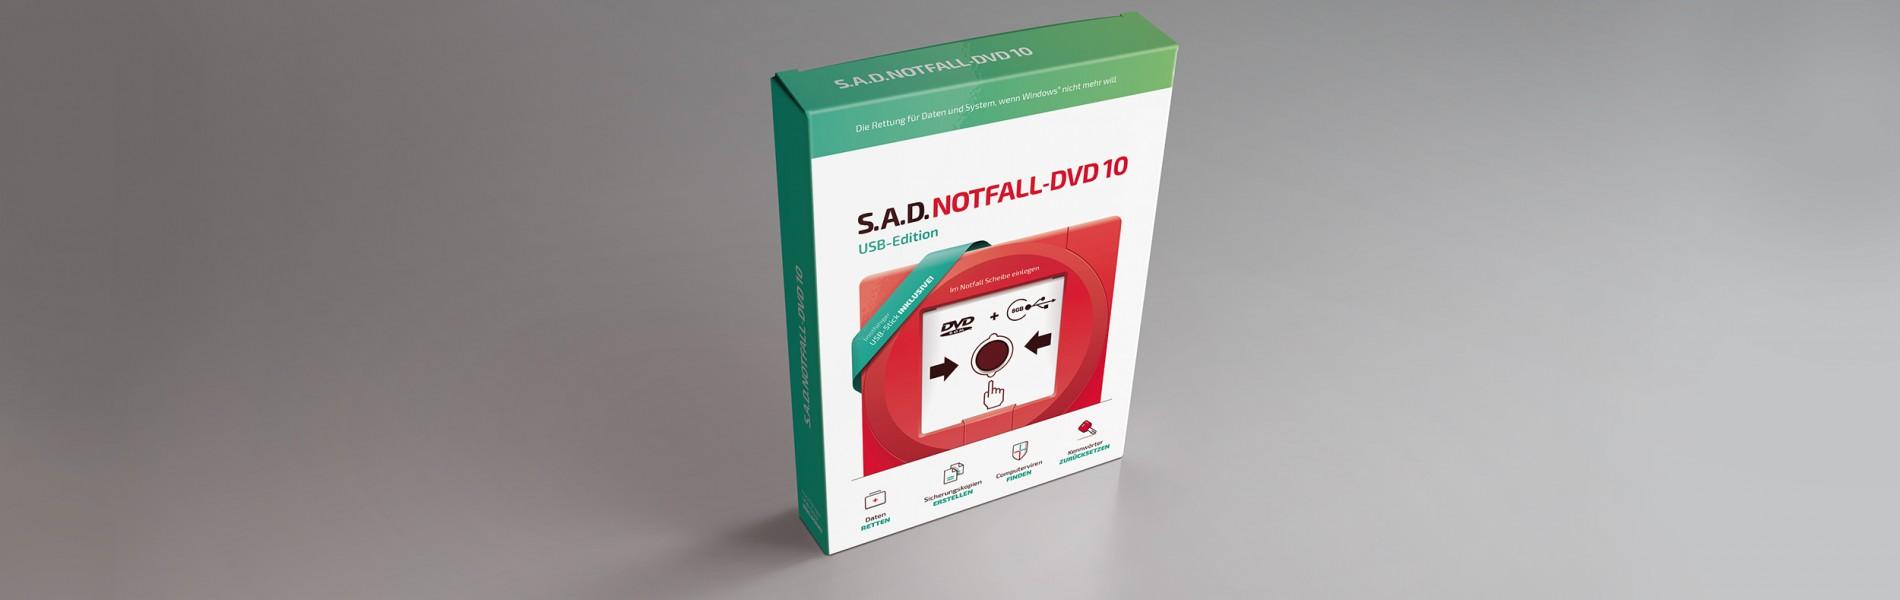 Notfall-DVD 10 auf Datenrettungs-USB-Stick